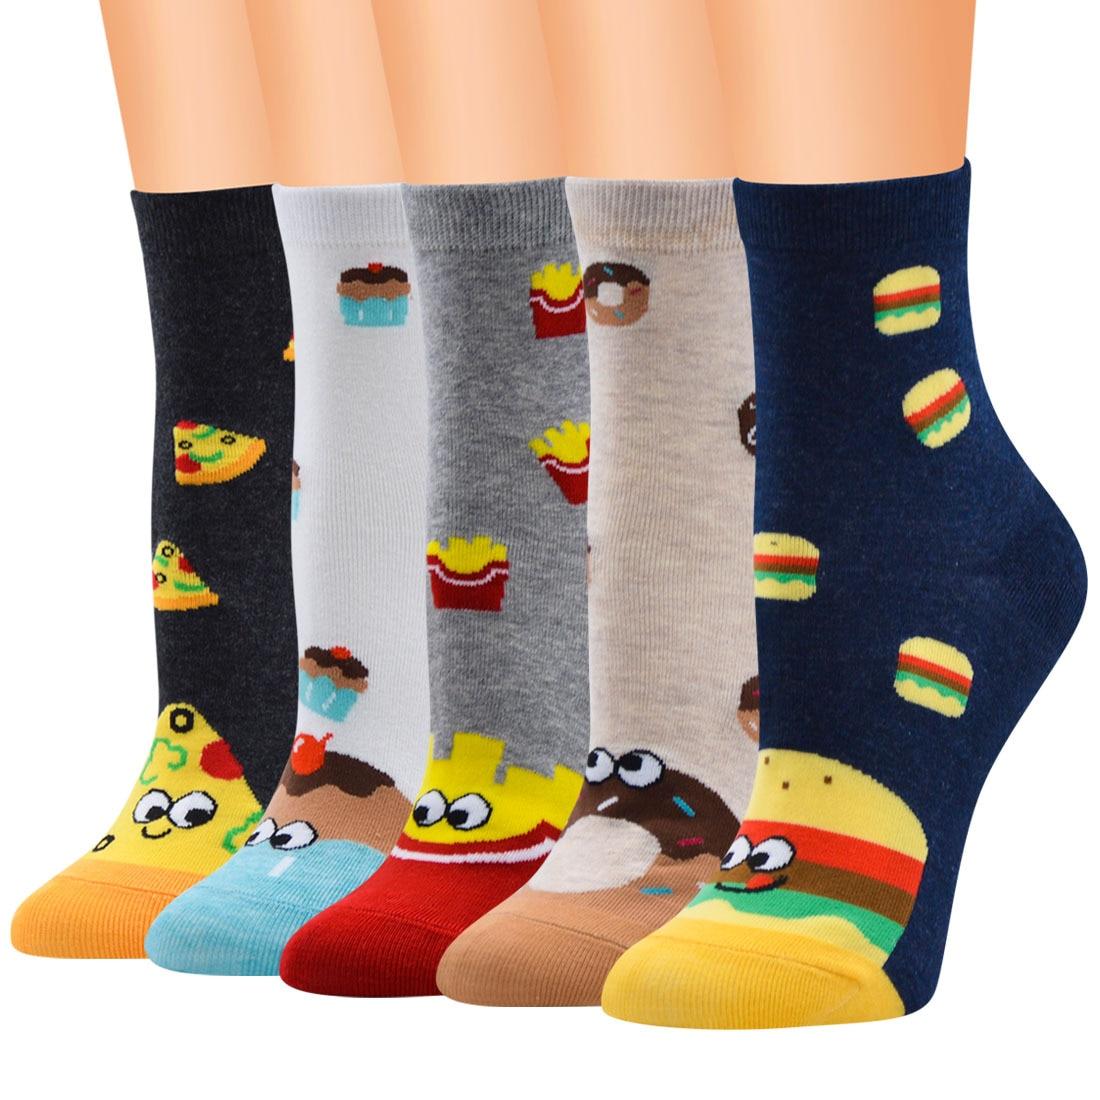 Female Cotton Footwear Women Low Tube Ankle Size Food Print Pattern Knitted Carton Socks For Teenage Girls